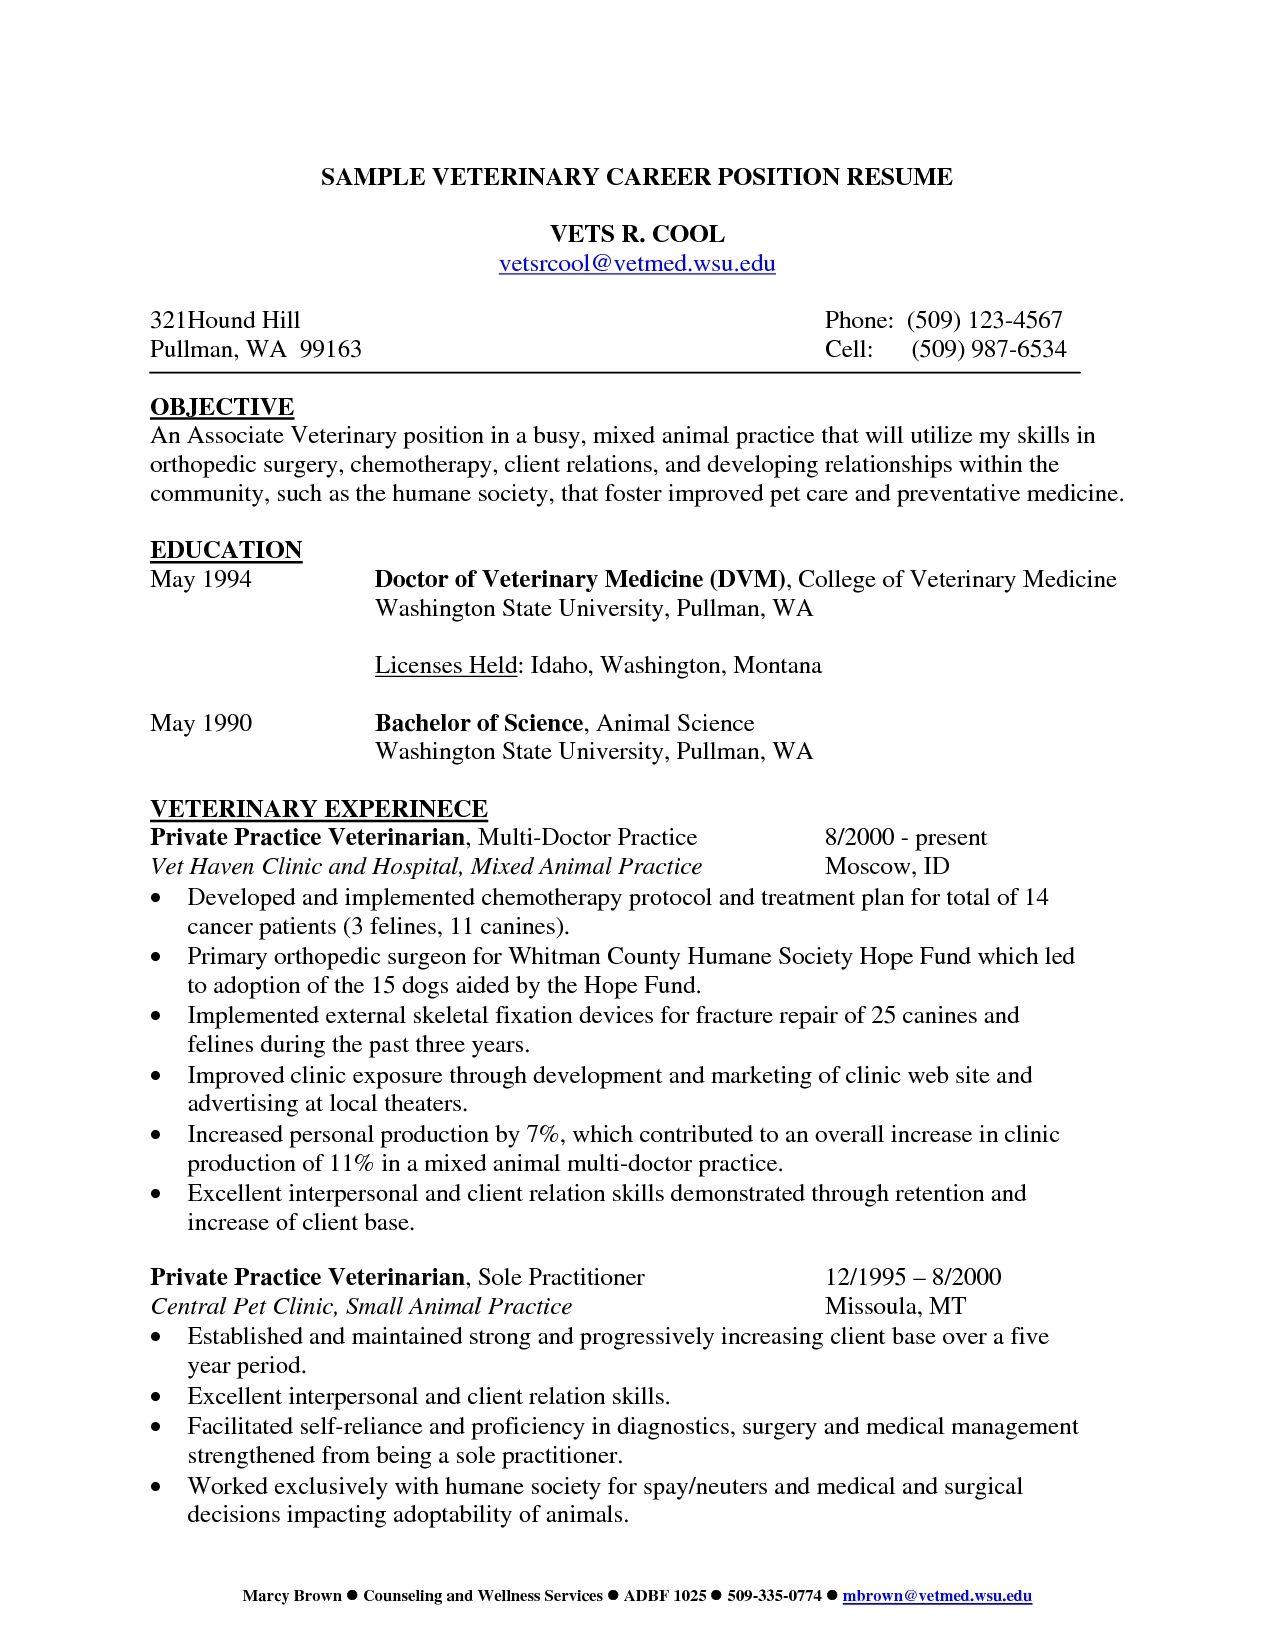 Cv Template Veterinary Student Student resume, Resume